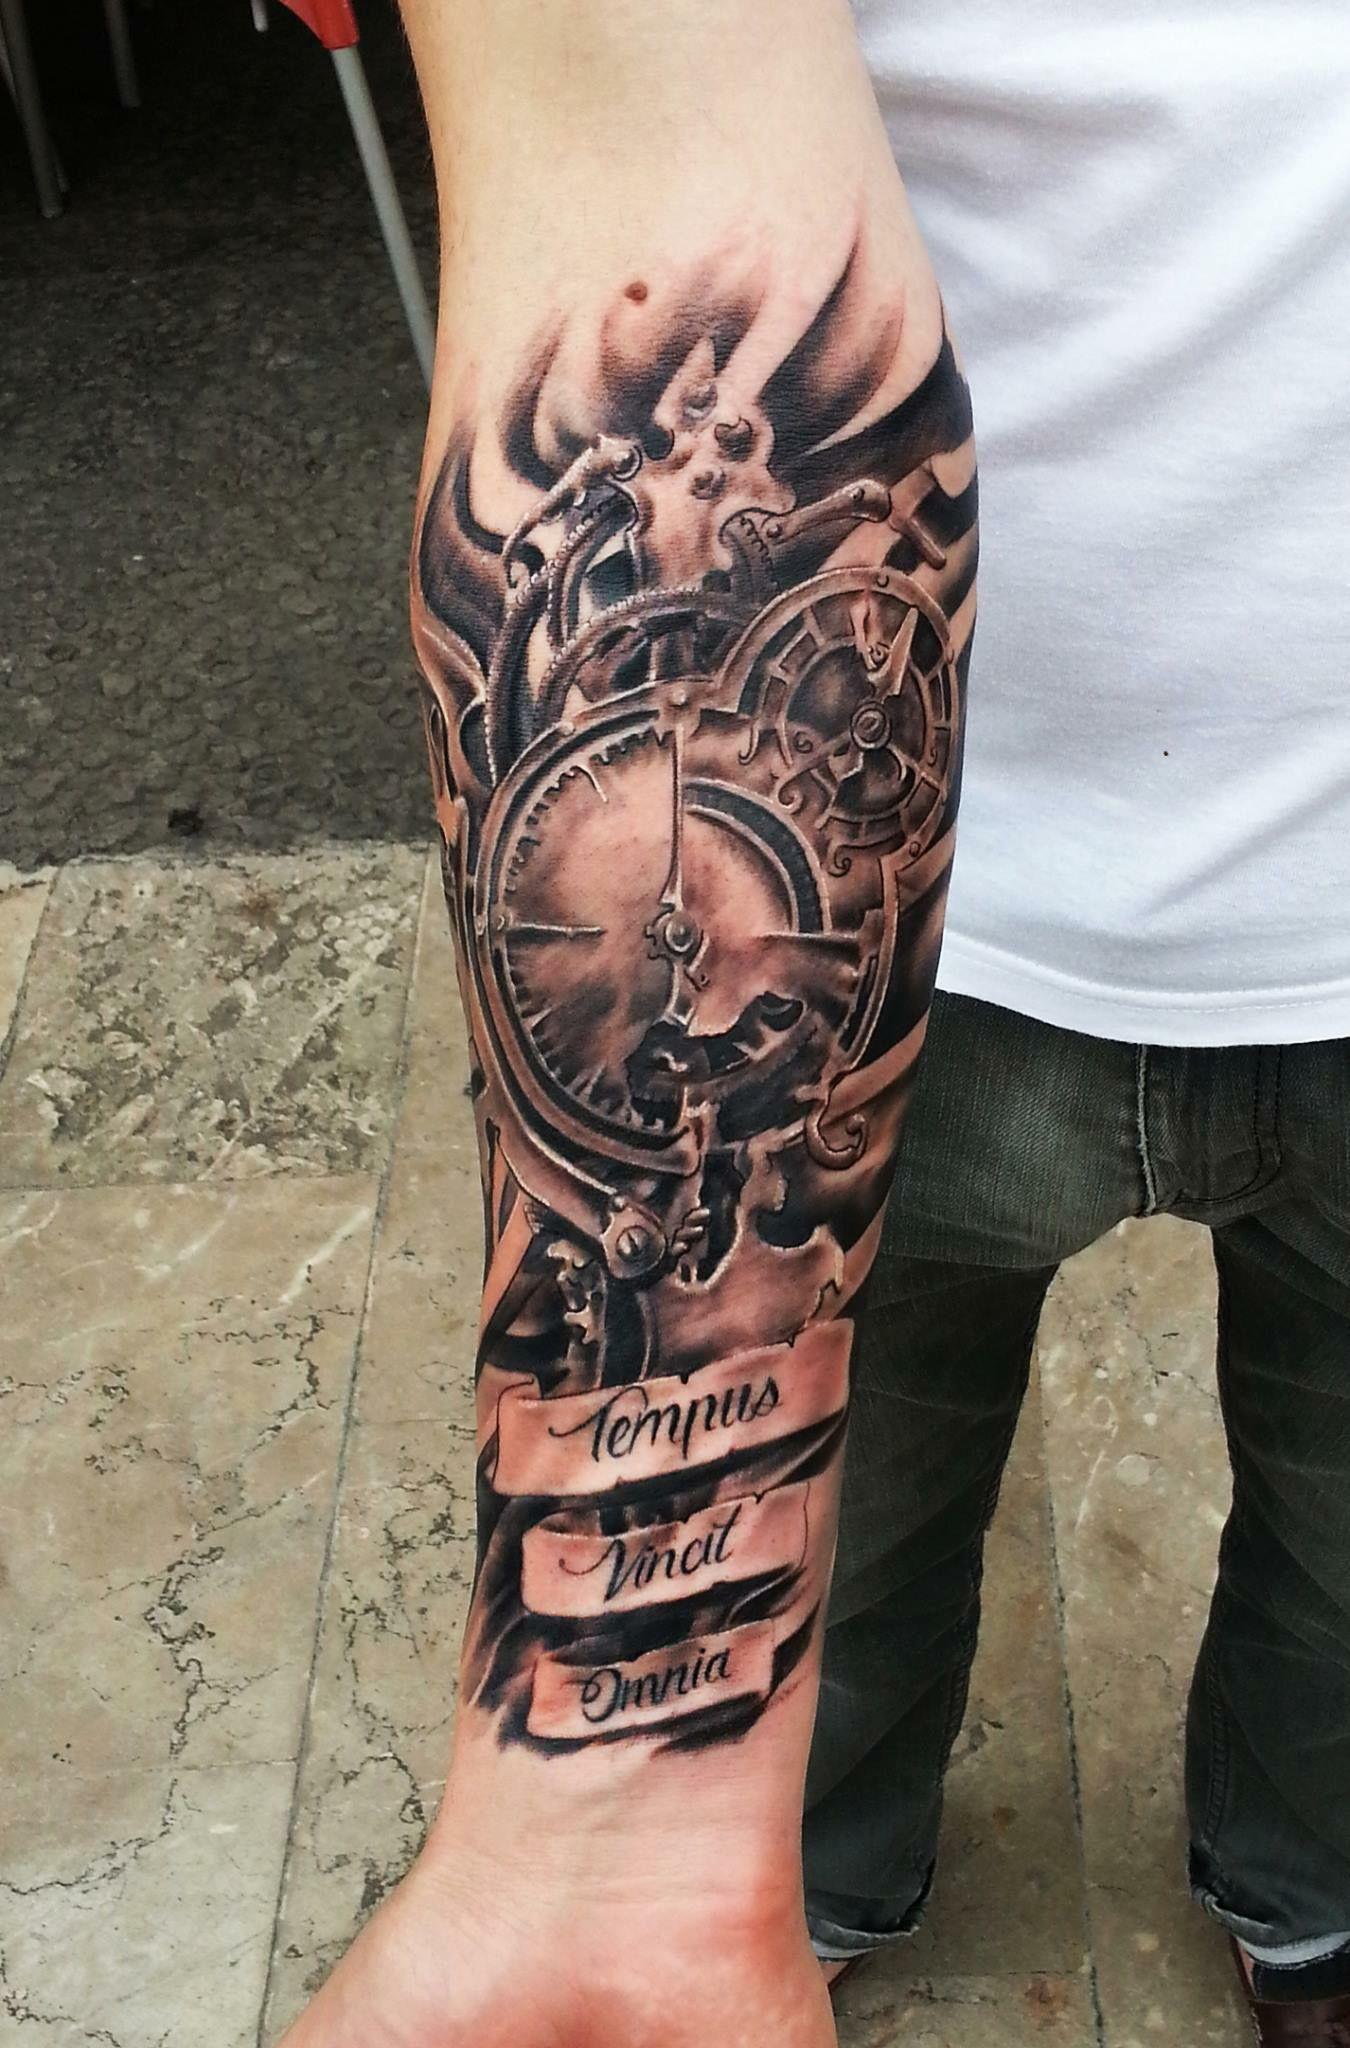 Pin Von Girl Loves Tattoos Auf Man And Tattoos Tattoo Ideen